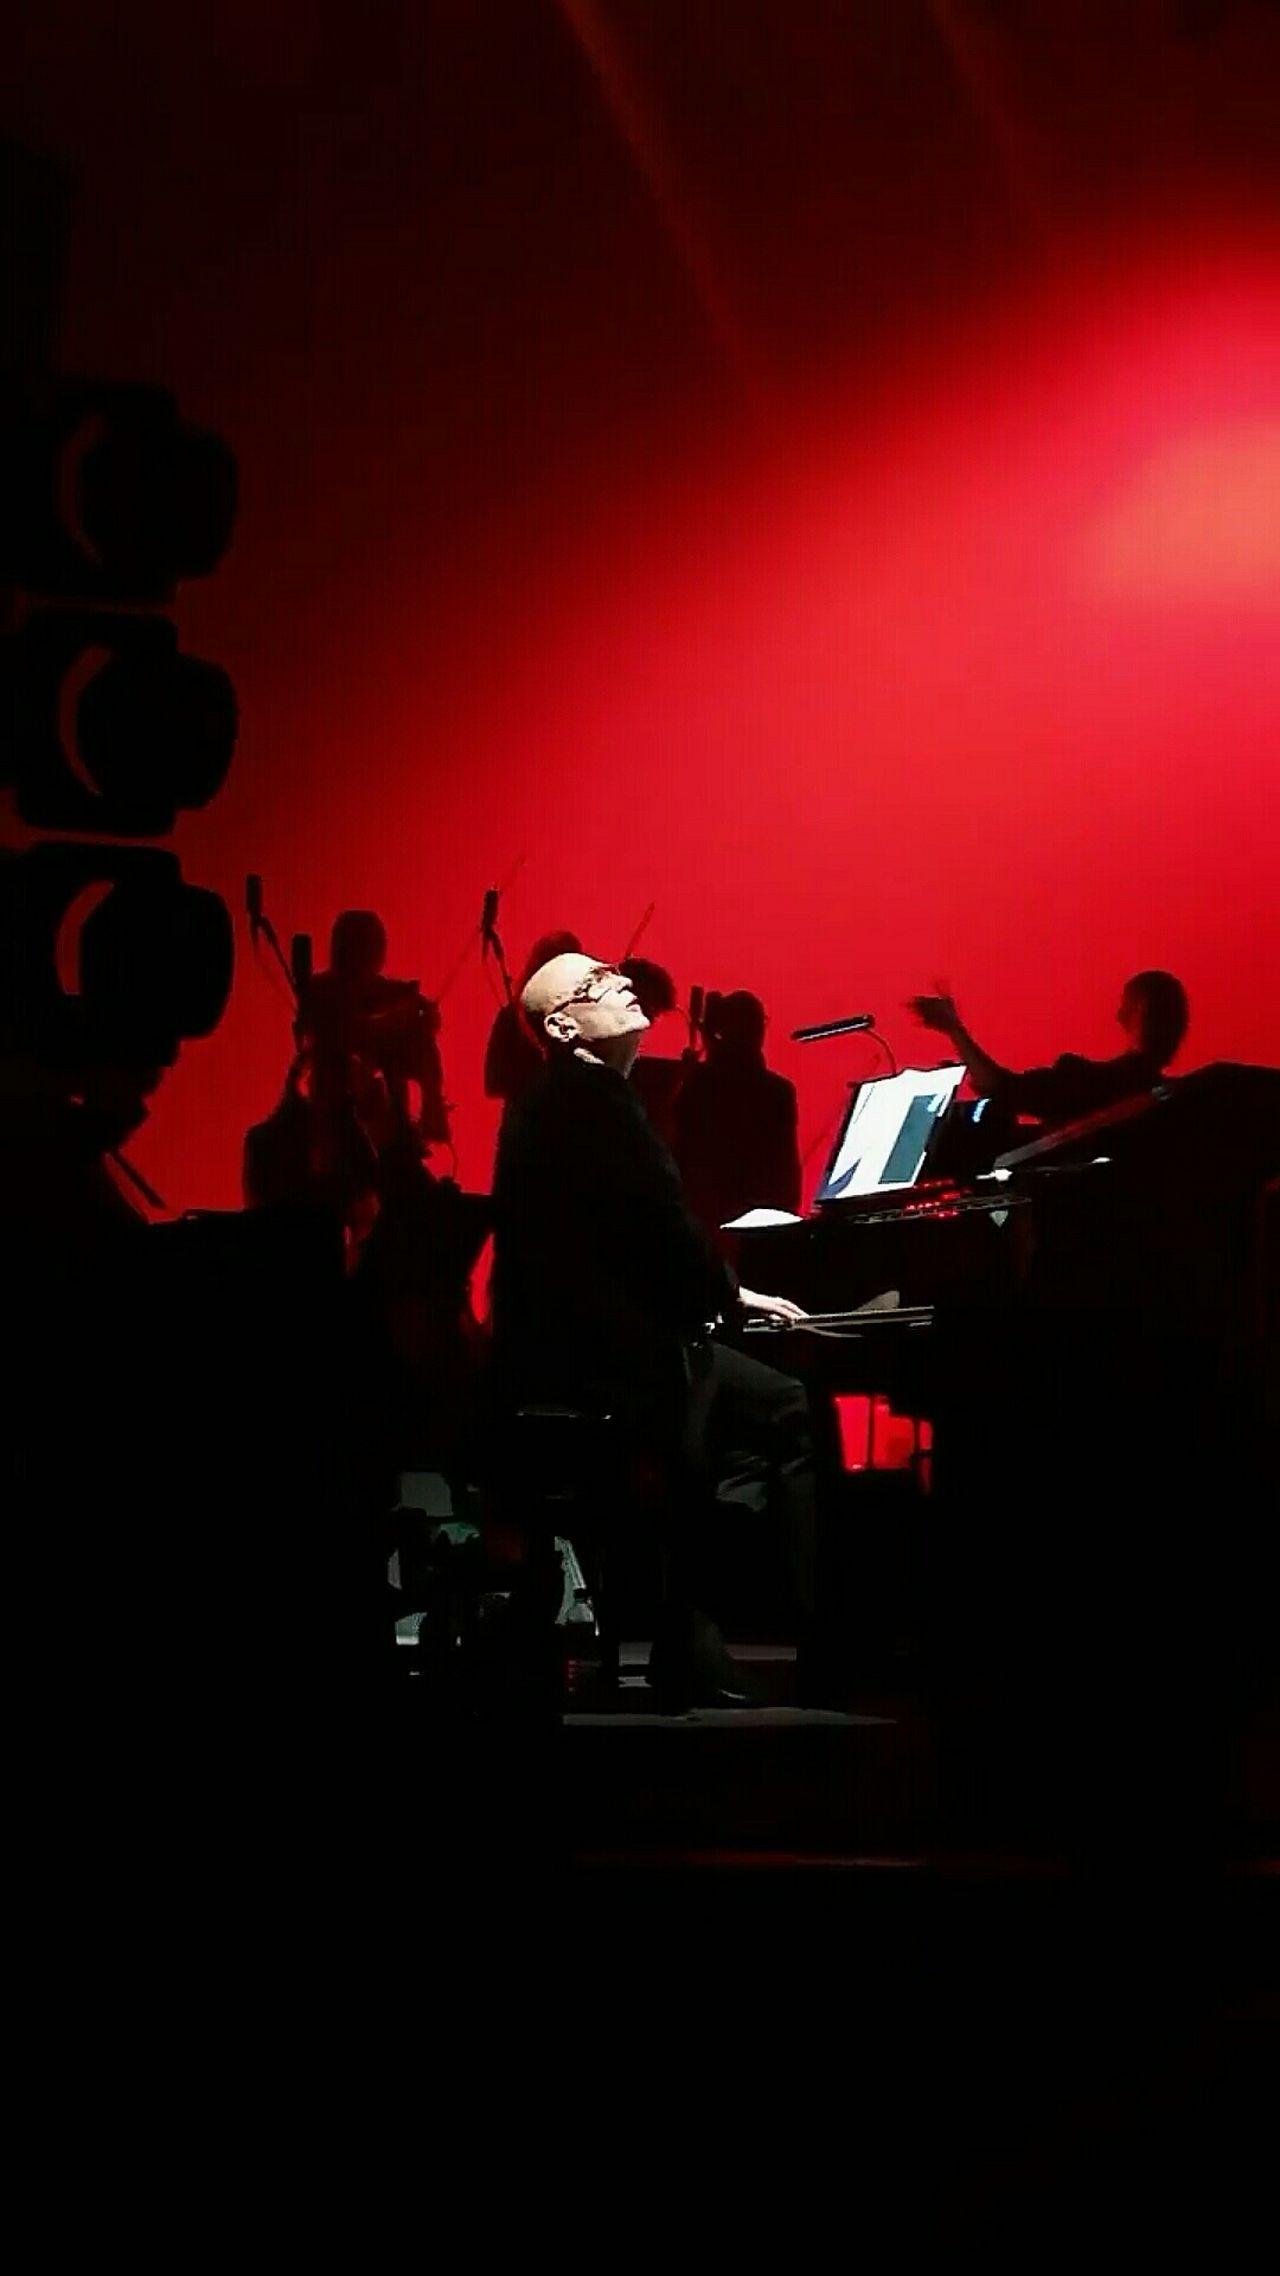 Mike Garson. Celebrating David Bowie. London Brixton o2. Music Arts Culture And Entertainment Performance David Bowie Jazz Music Piano London O2 Arena